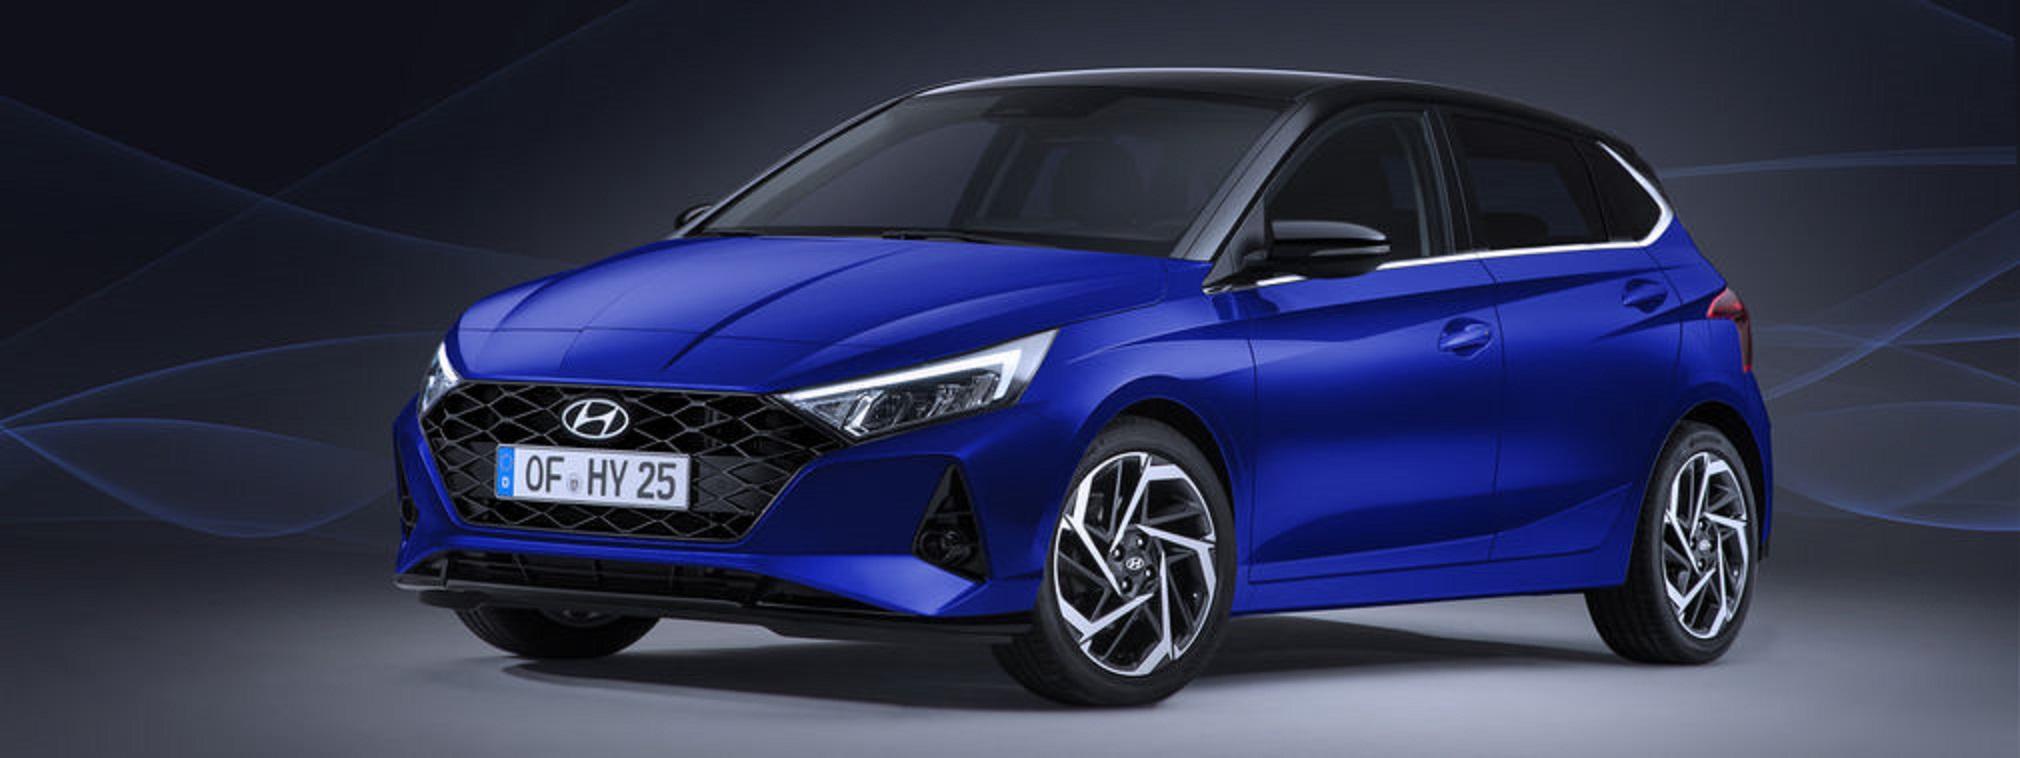 Esterni nuova Hyundai i20